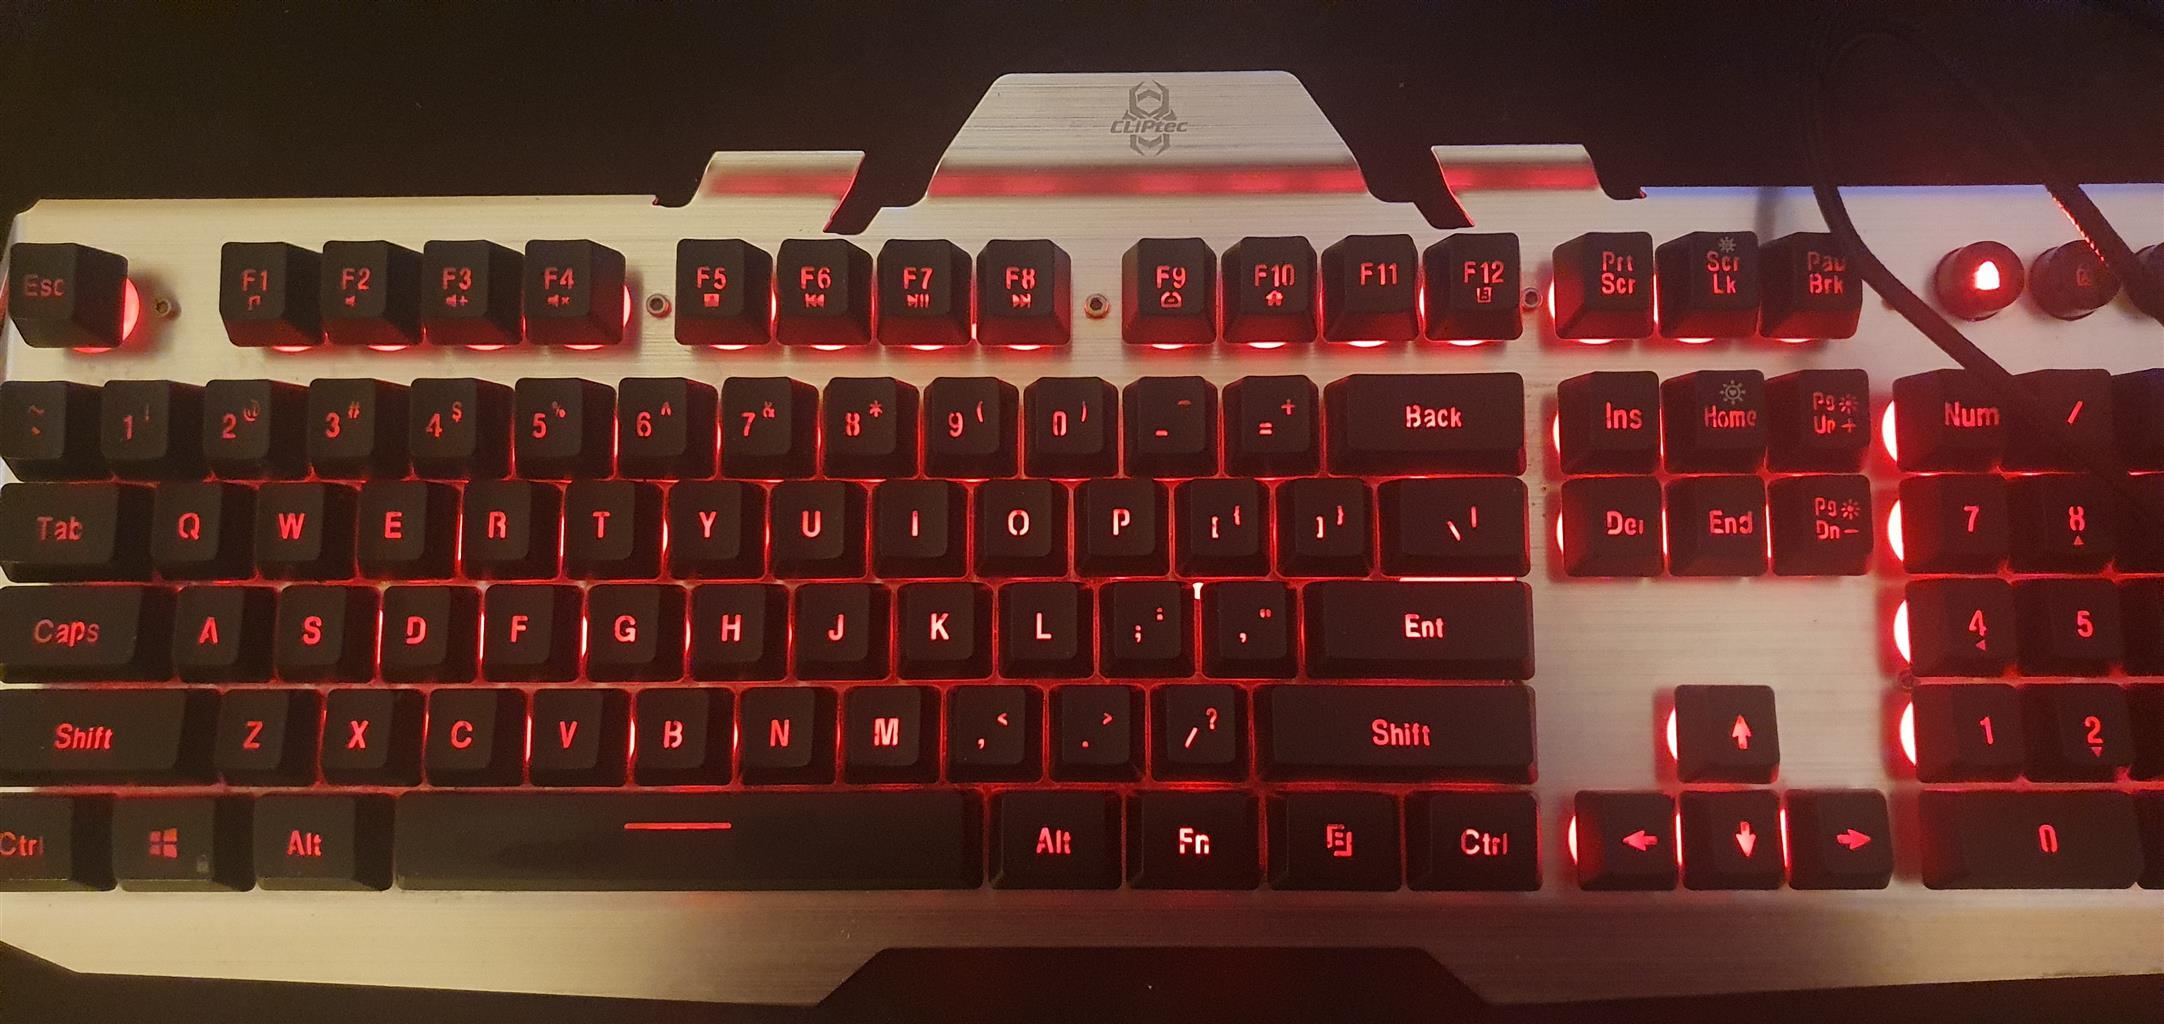 Cliptec Gaming Keyboard